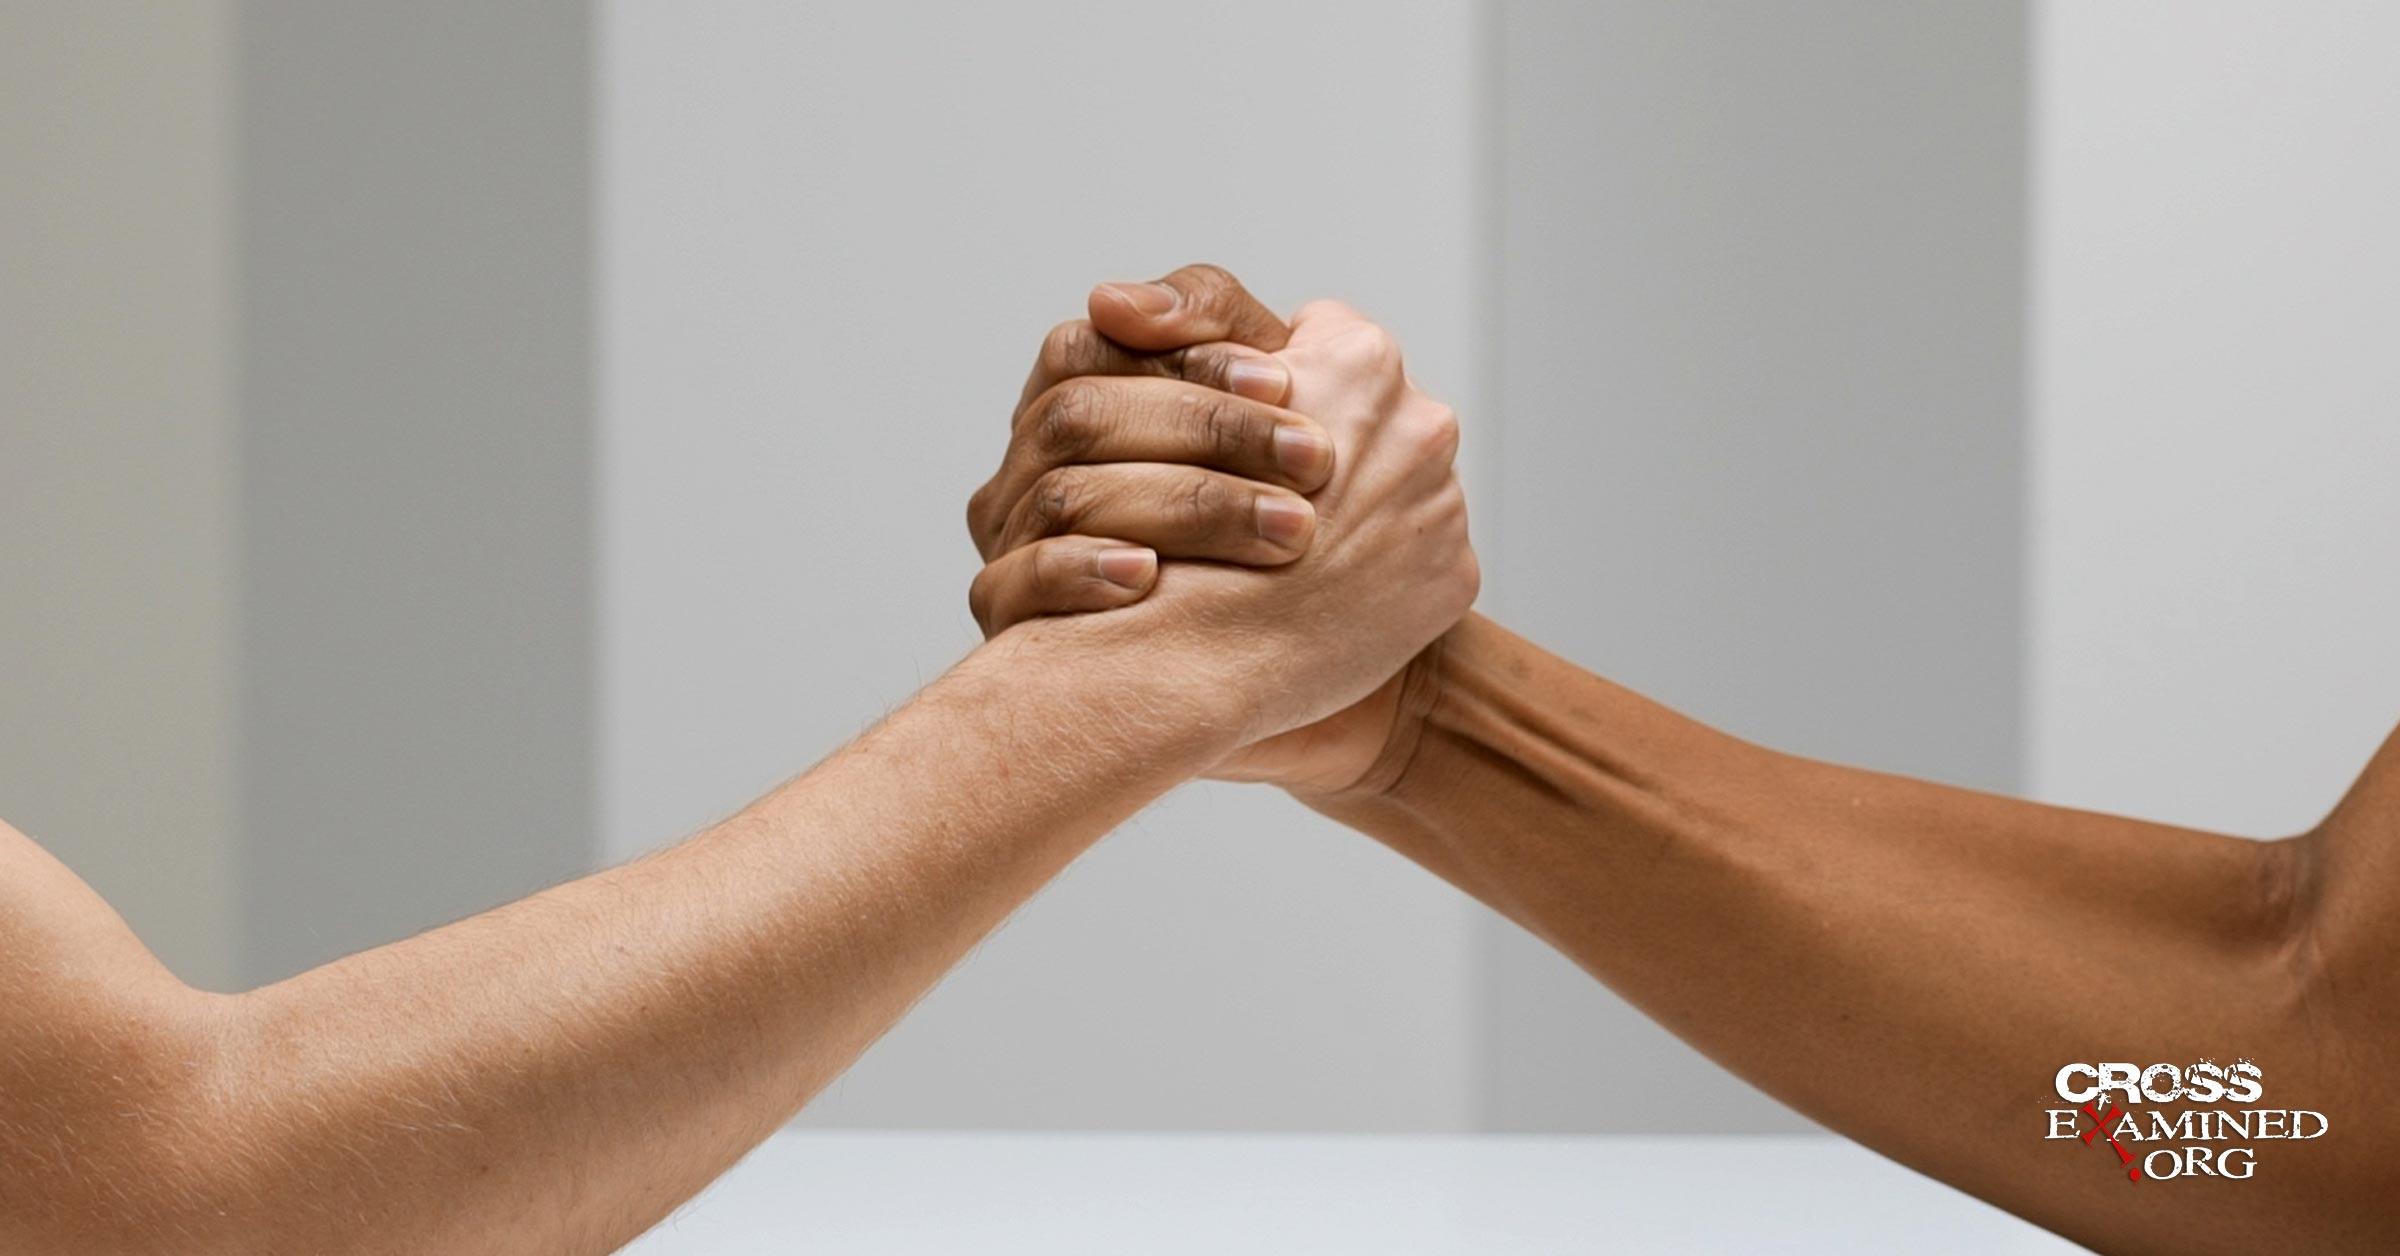 Racism, Racial Reconciliation & The Gospel